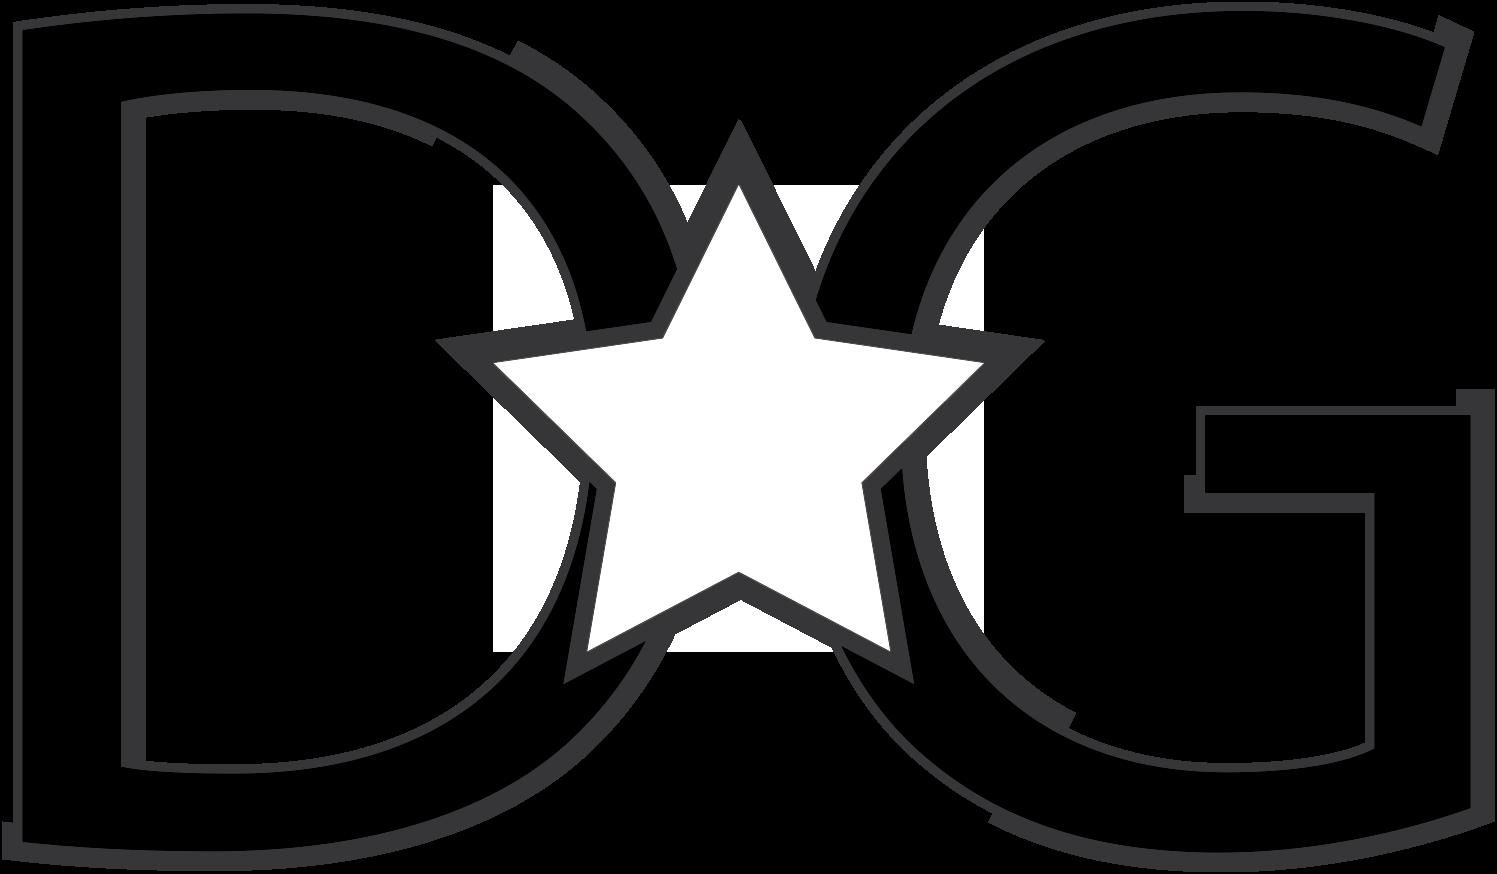 DG-logo-new.png